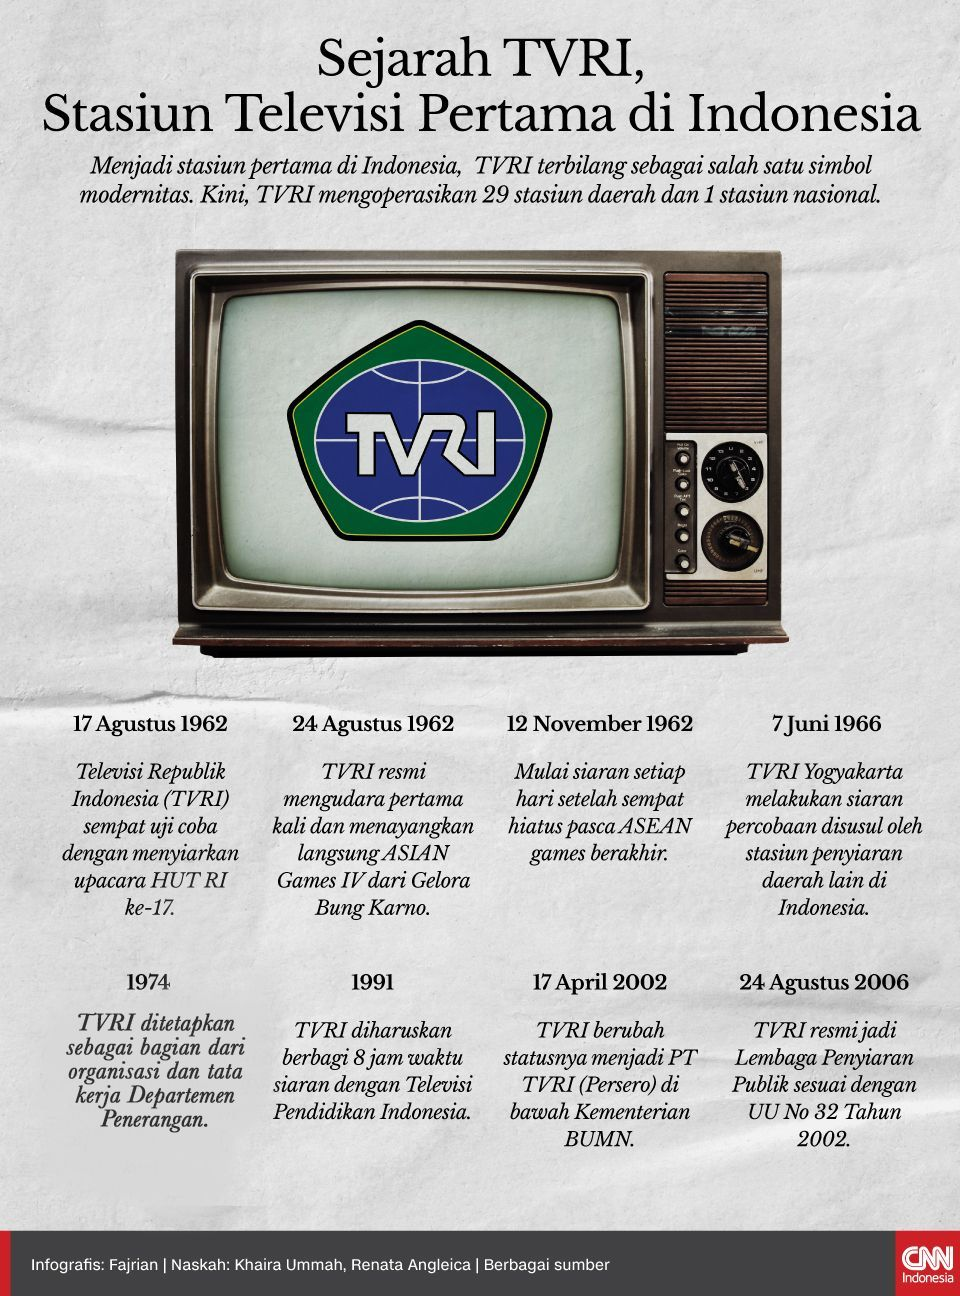 Infografis Sejarah TVRI, stasiun Televisi Pertama di Indonesia